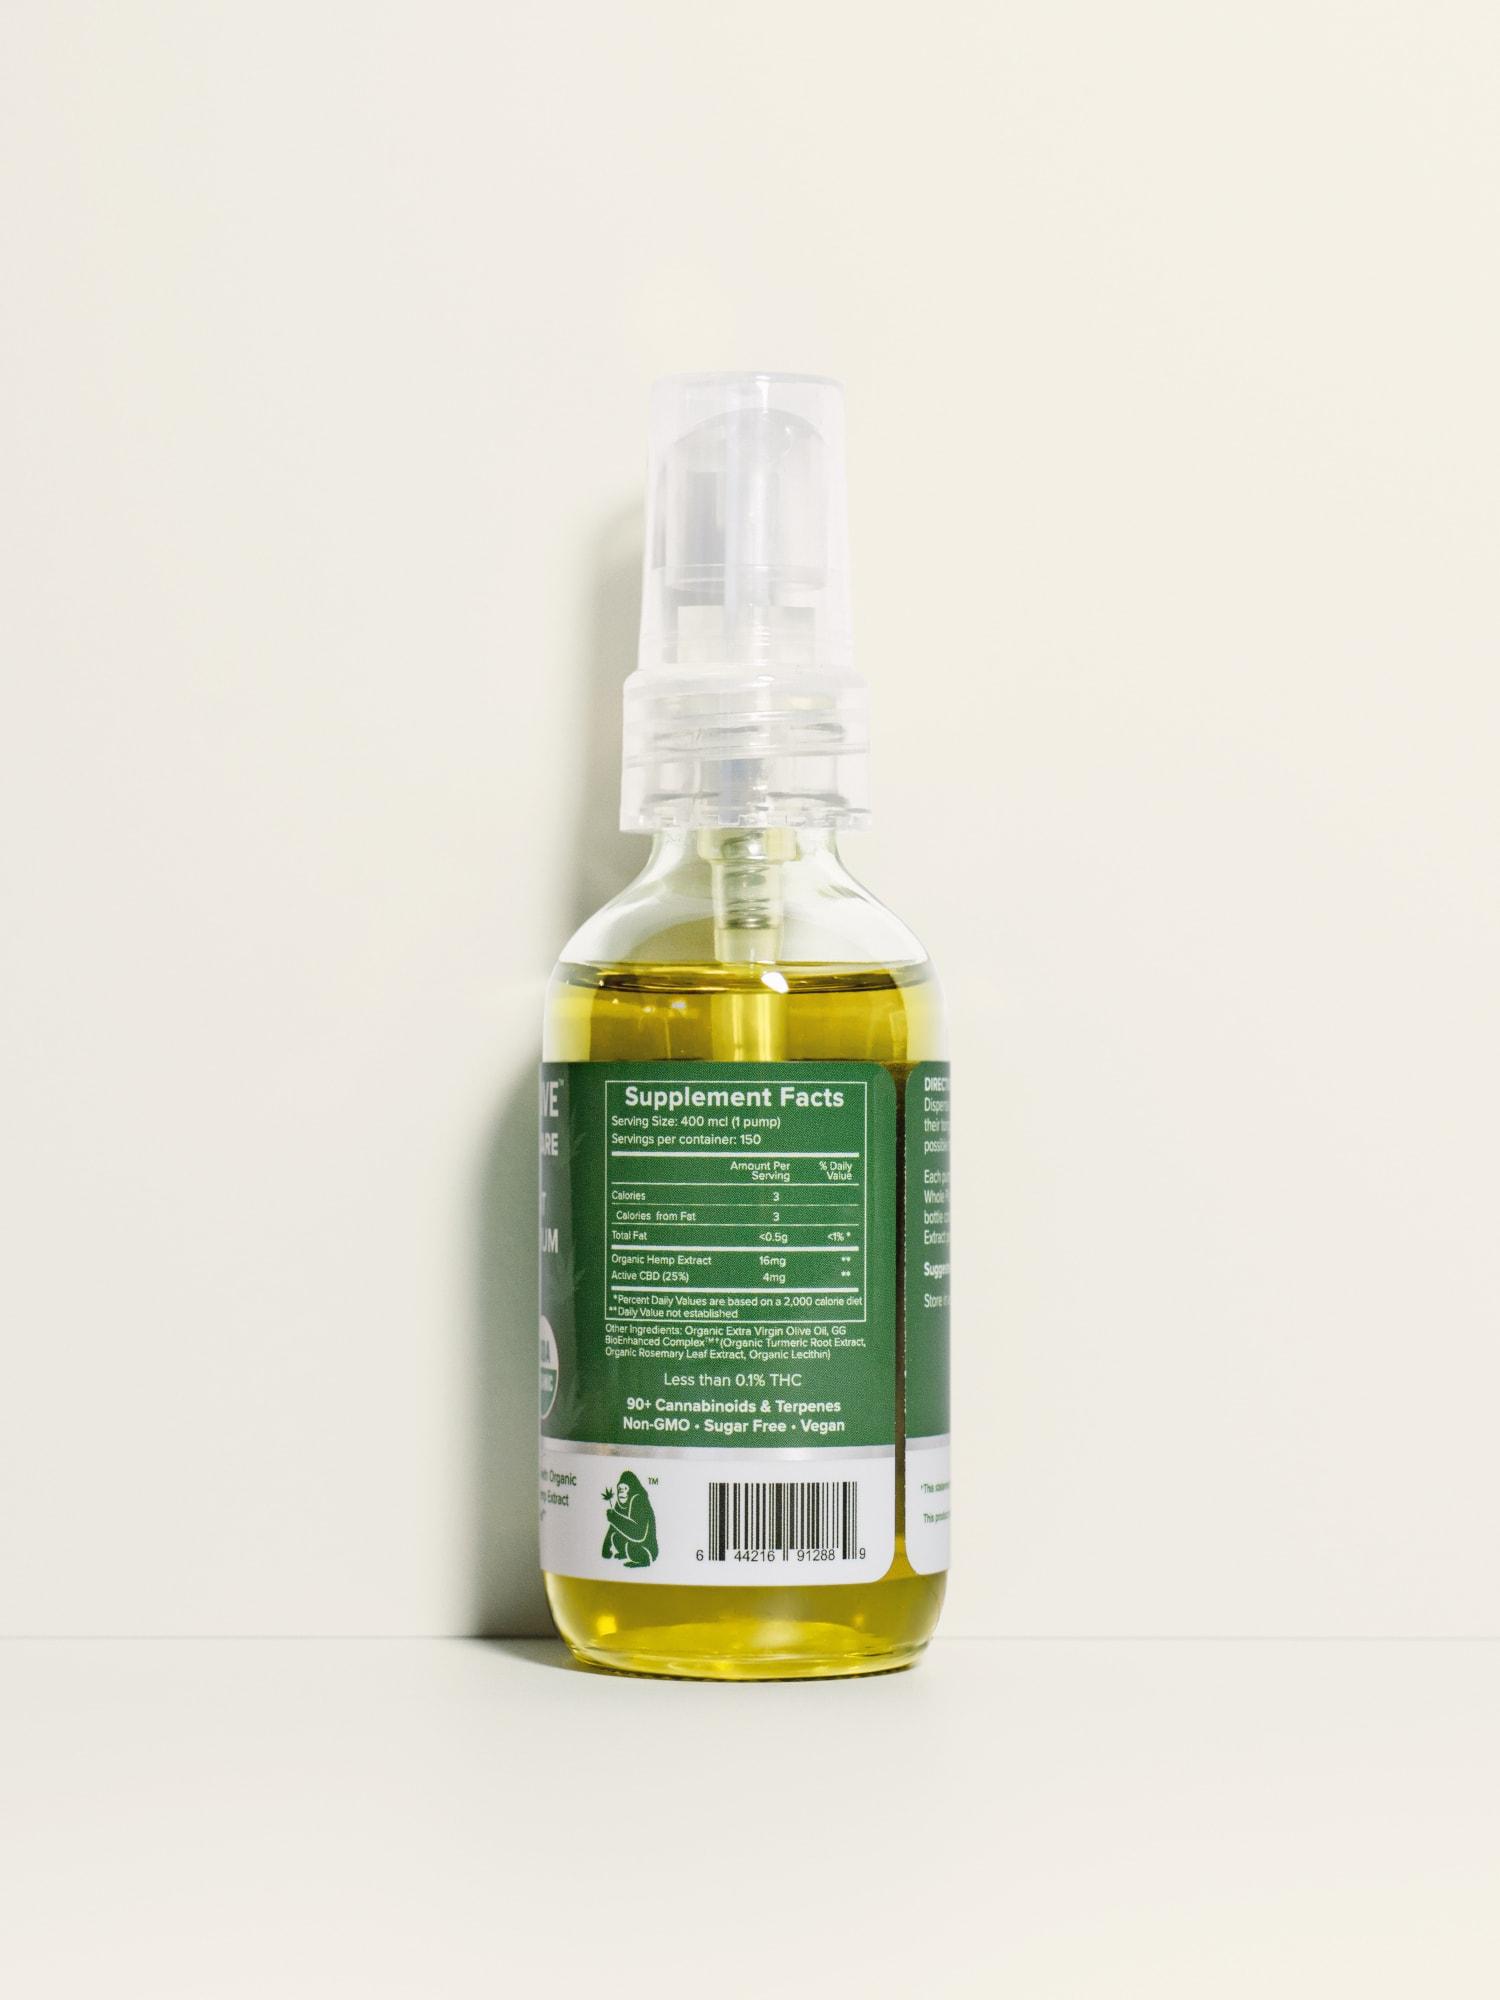 Buy USDA Certified Organic Full Spectrum CBD Oil from Hemp Extract for Horses - 2400 mg